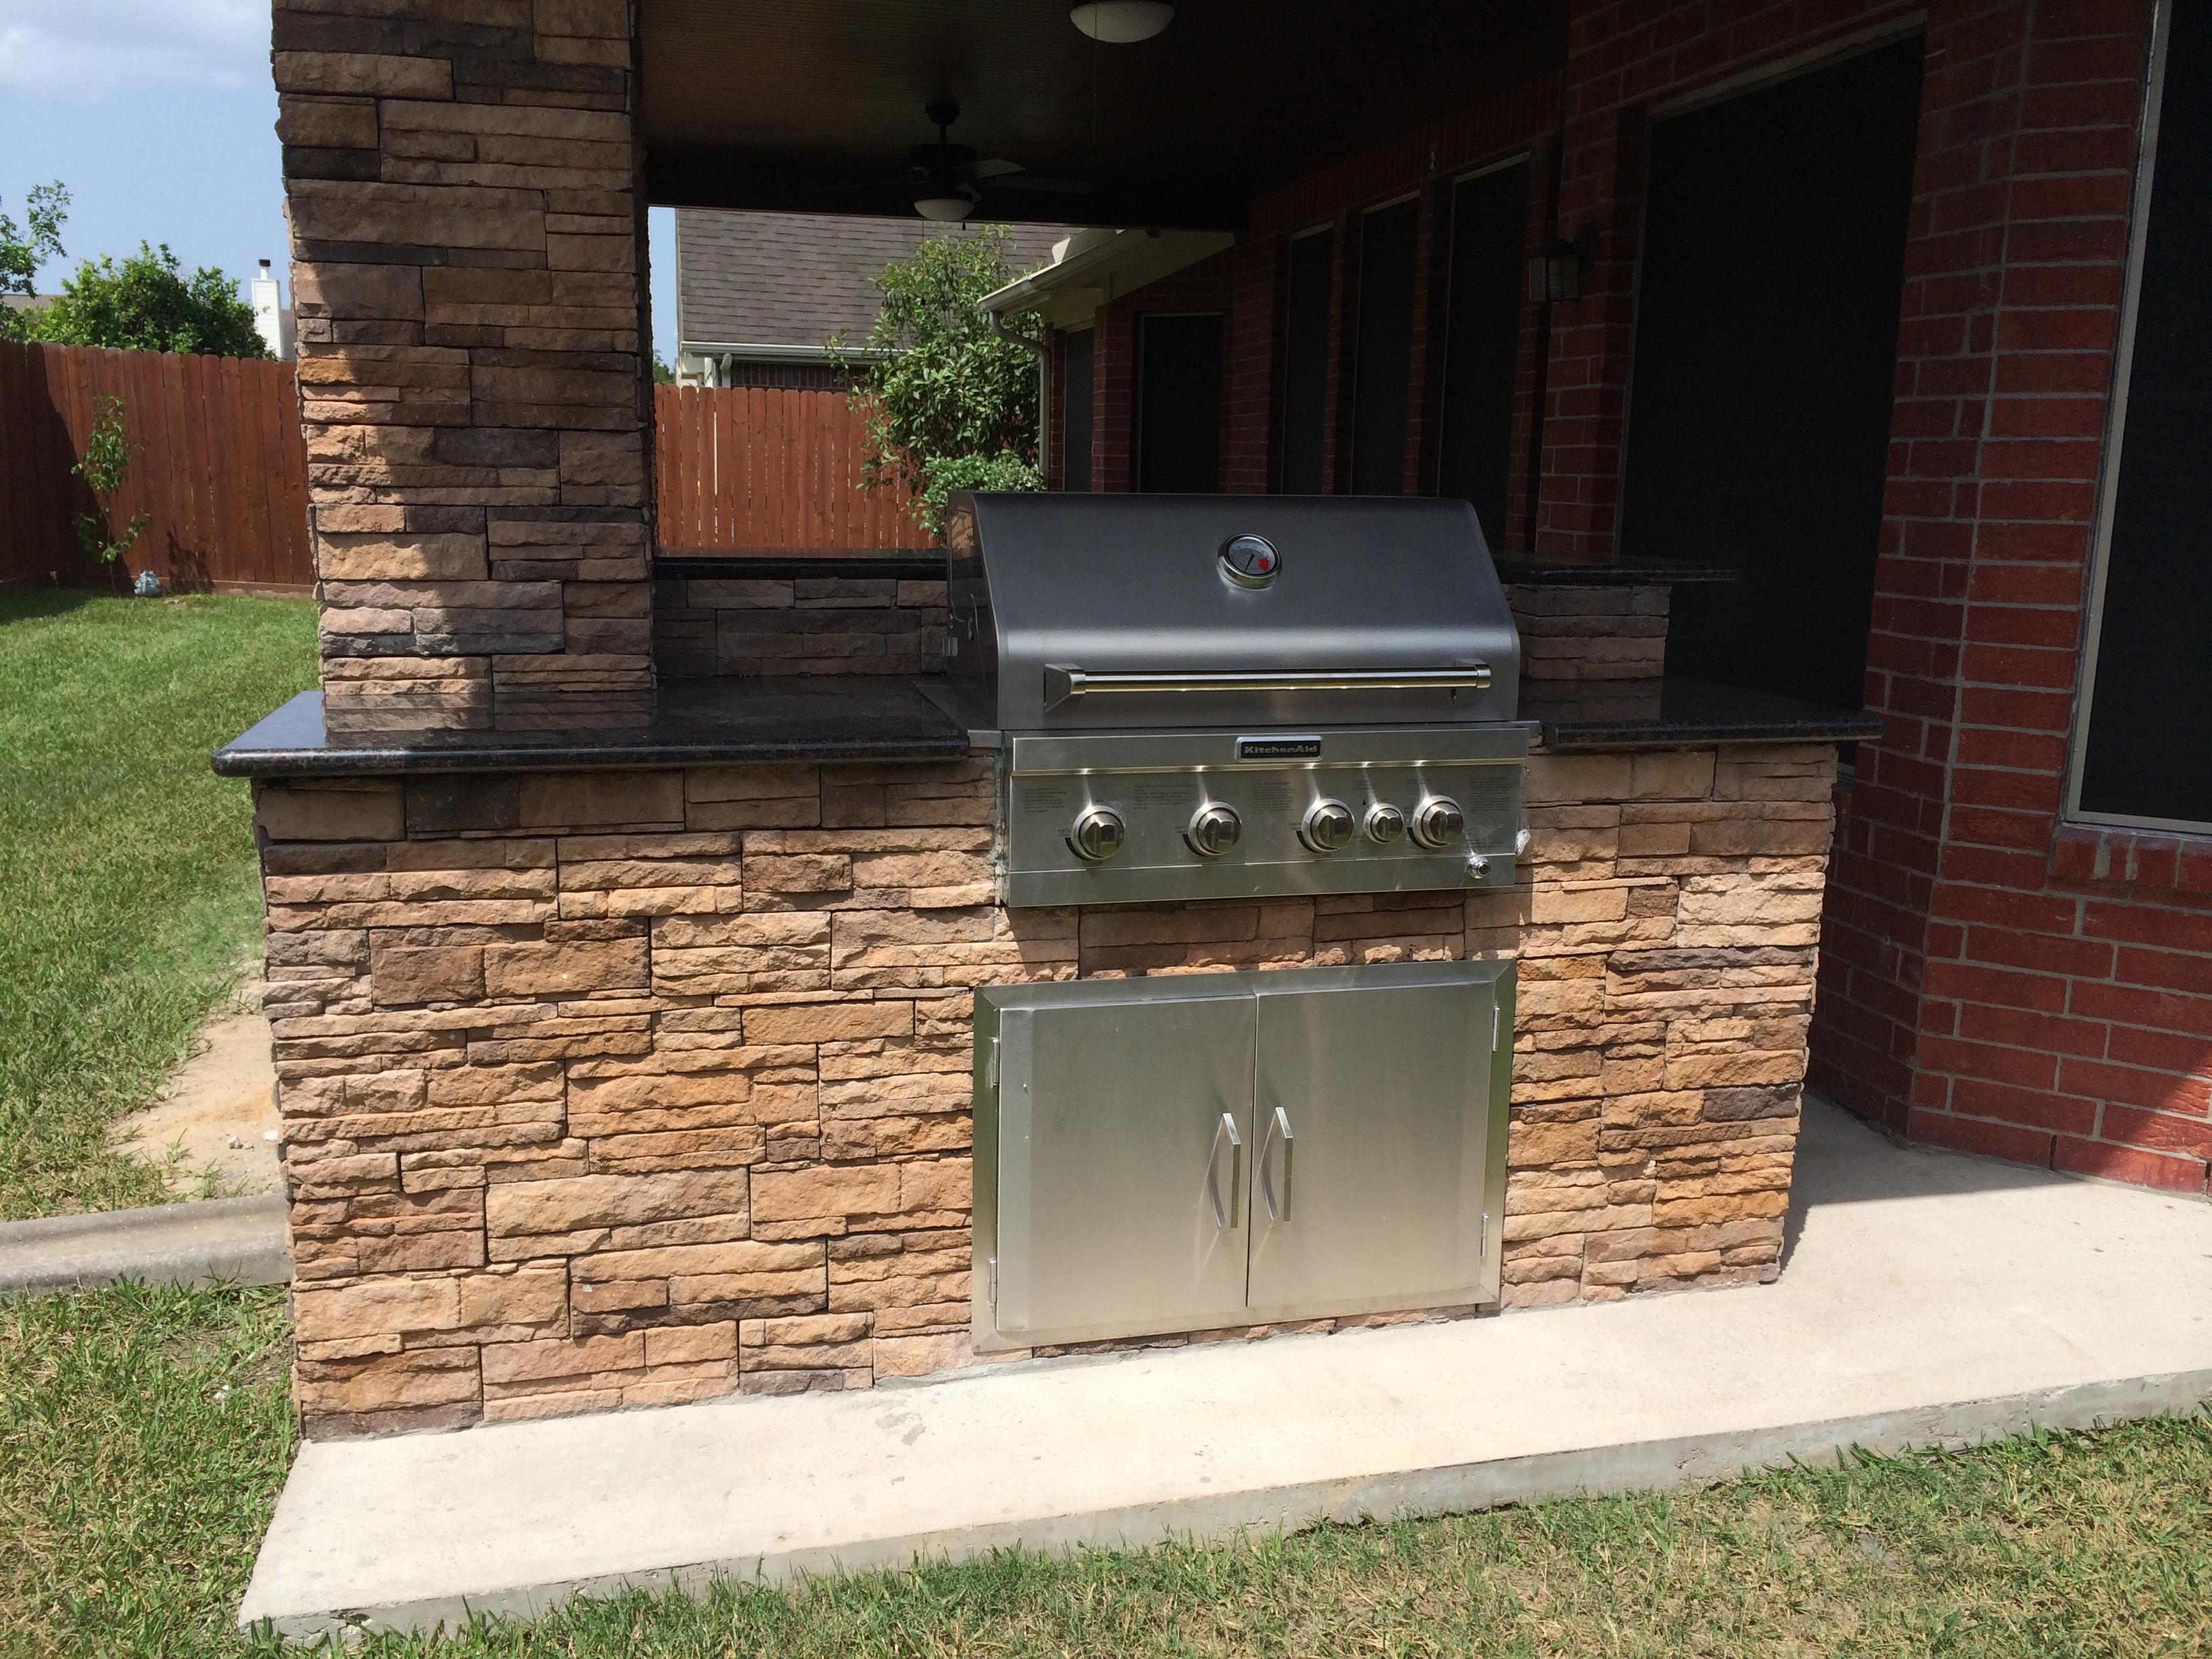 Mills Outdoor Kitchen - Complete